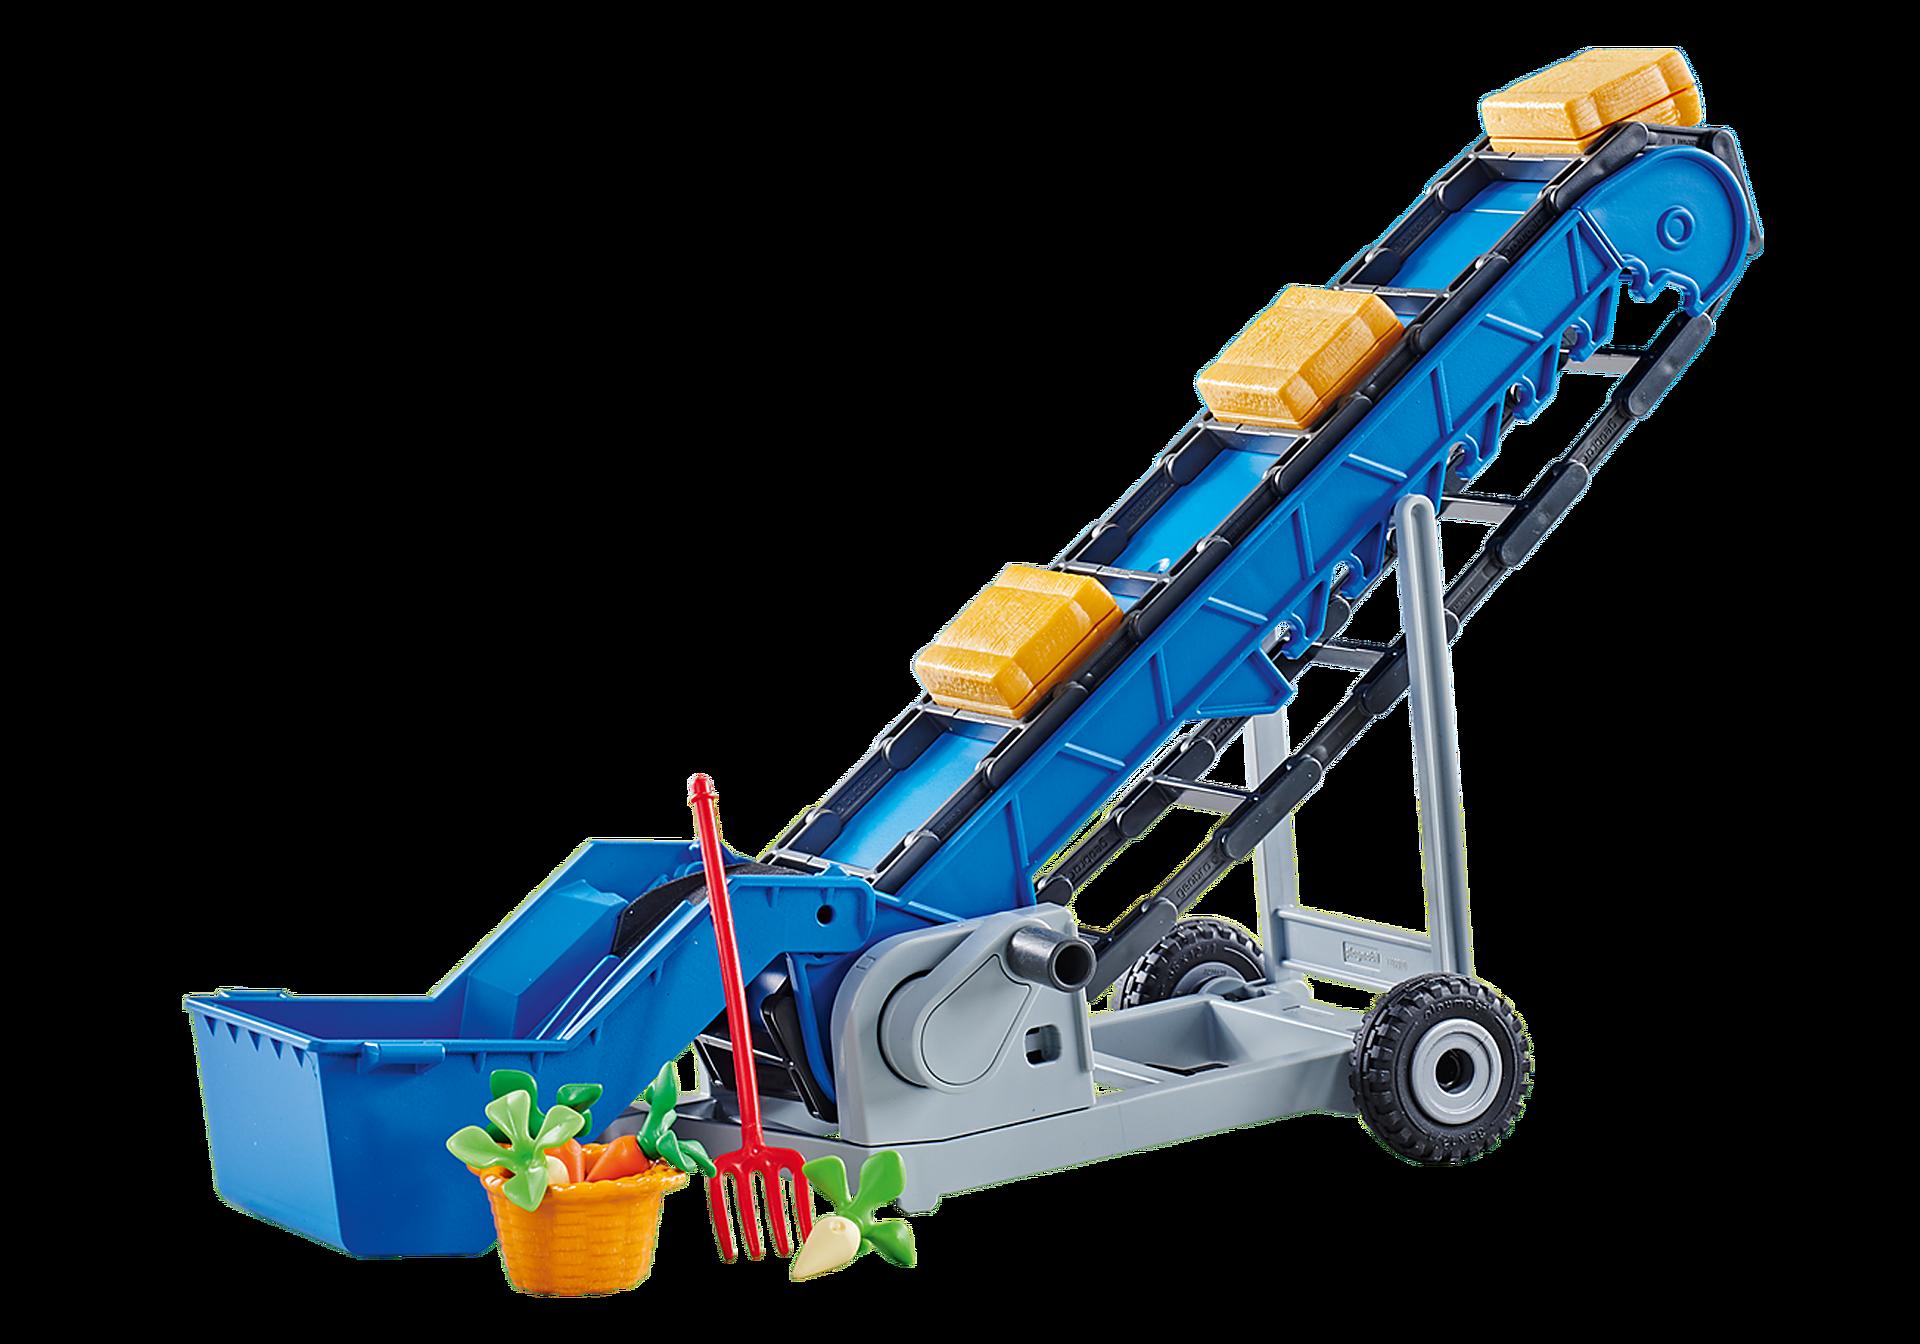 http://media.playmobil.com/i/playmobil/6576_product_detail/Convoyeur à foin